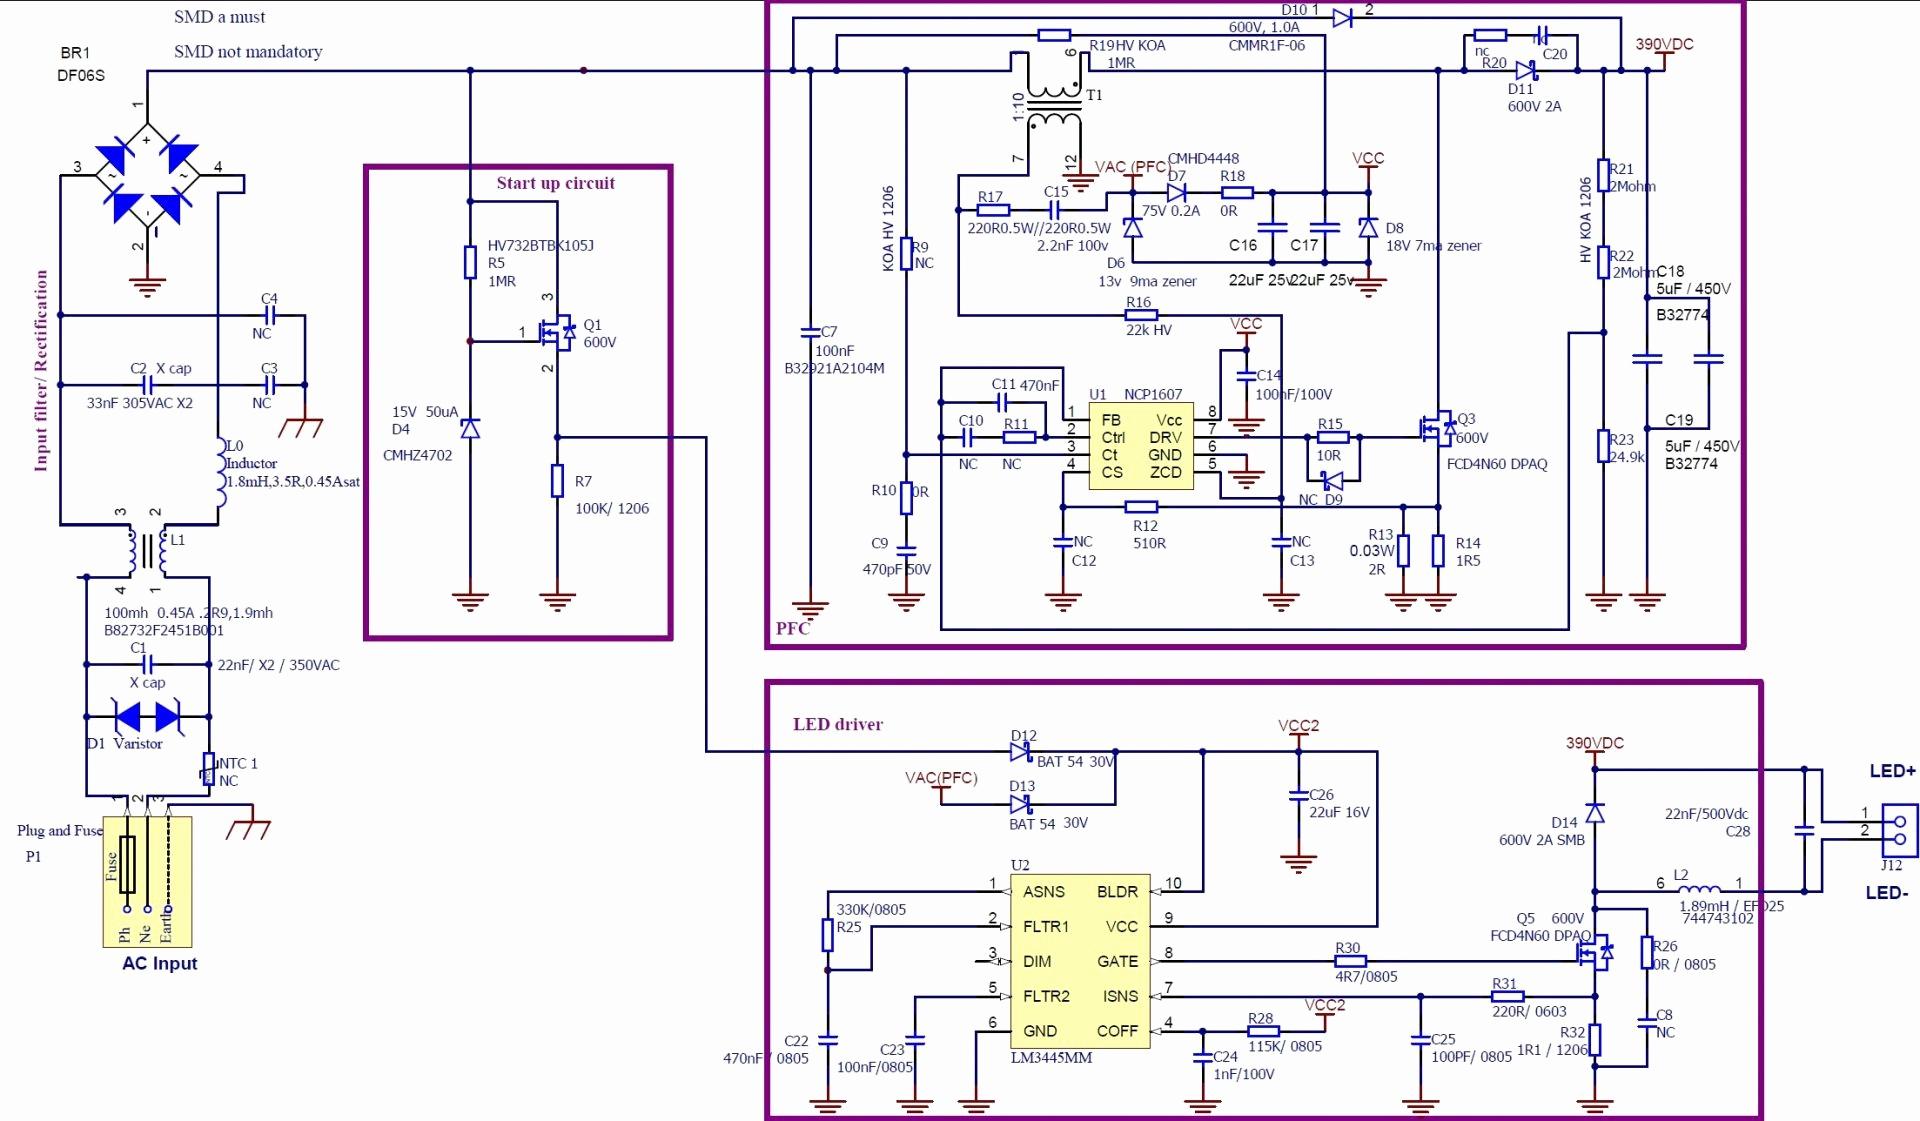 4 Lamp T8 Ballast Wiring Diagram For Tandum   Wiring Diagram Library - 4 Lamp 2 Ballast Wiring Diagram